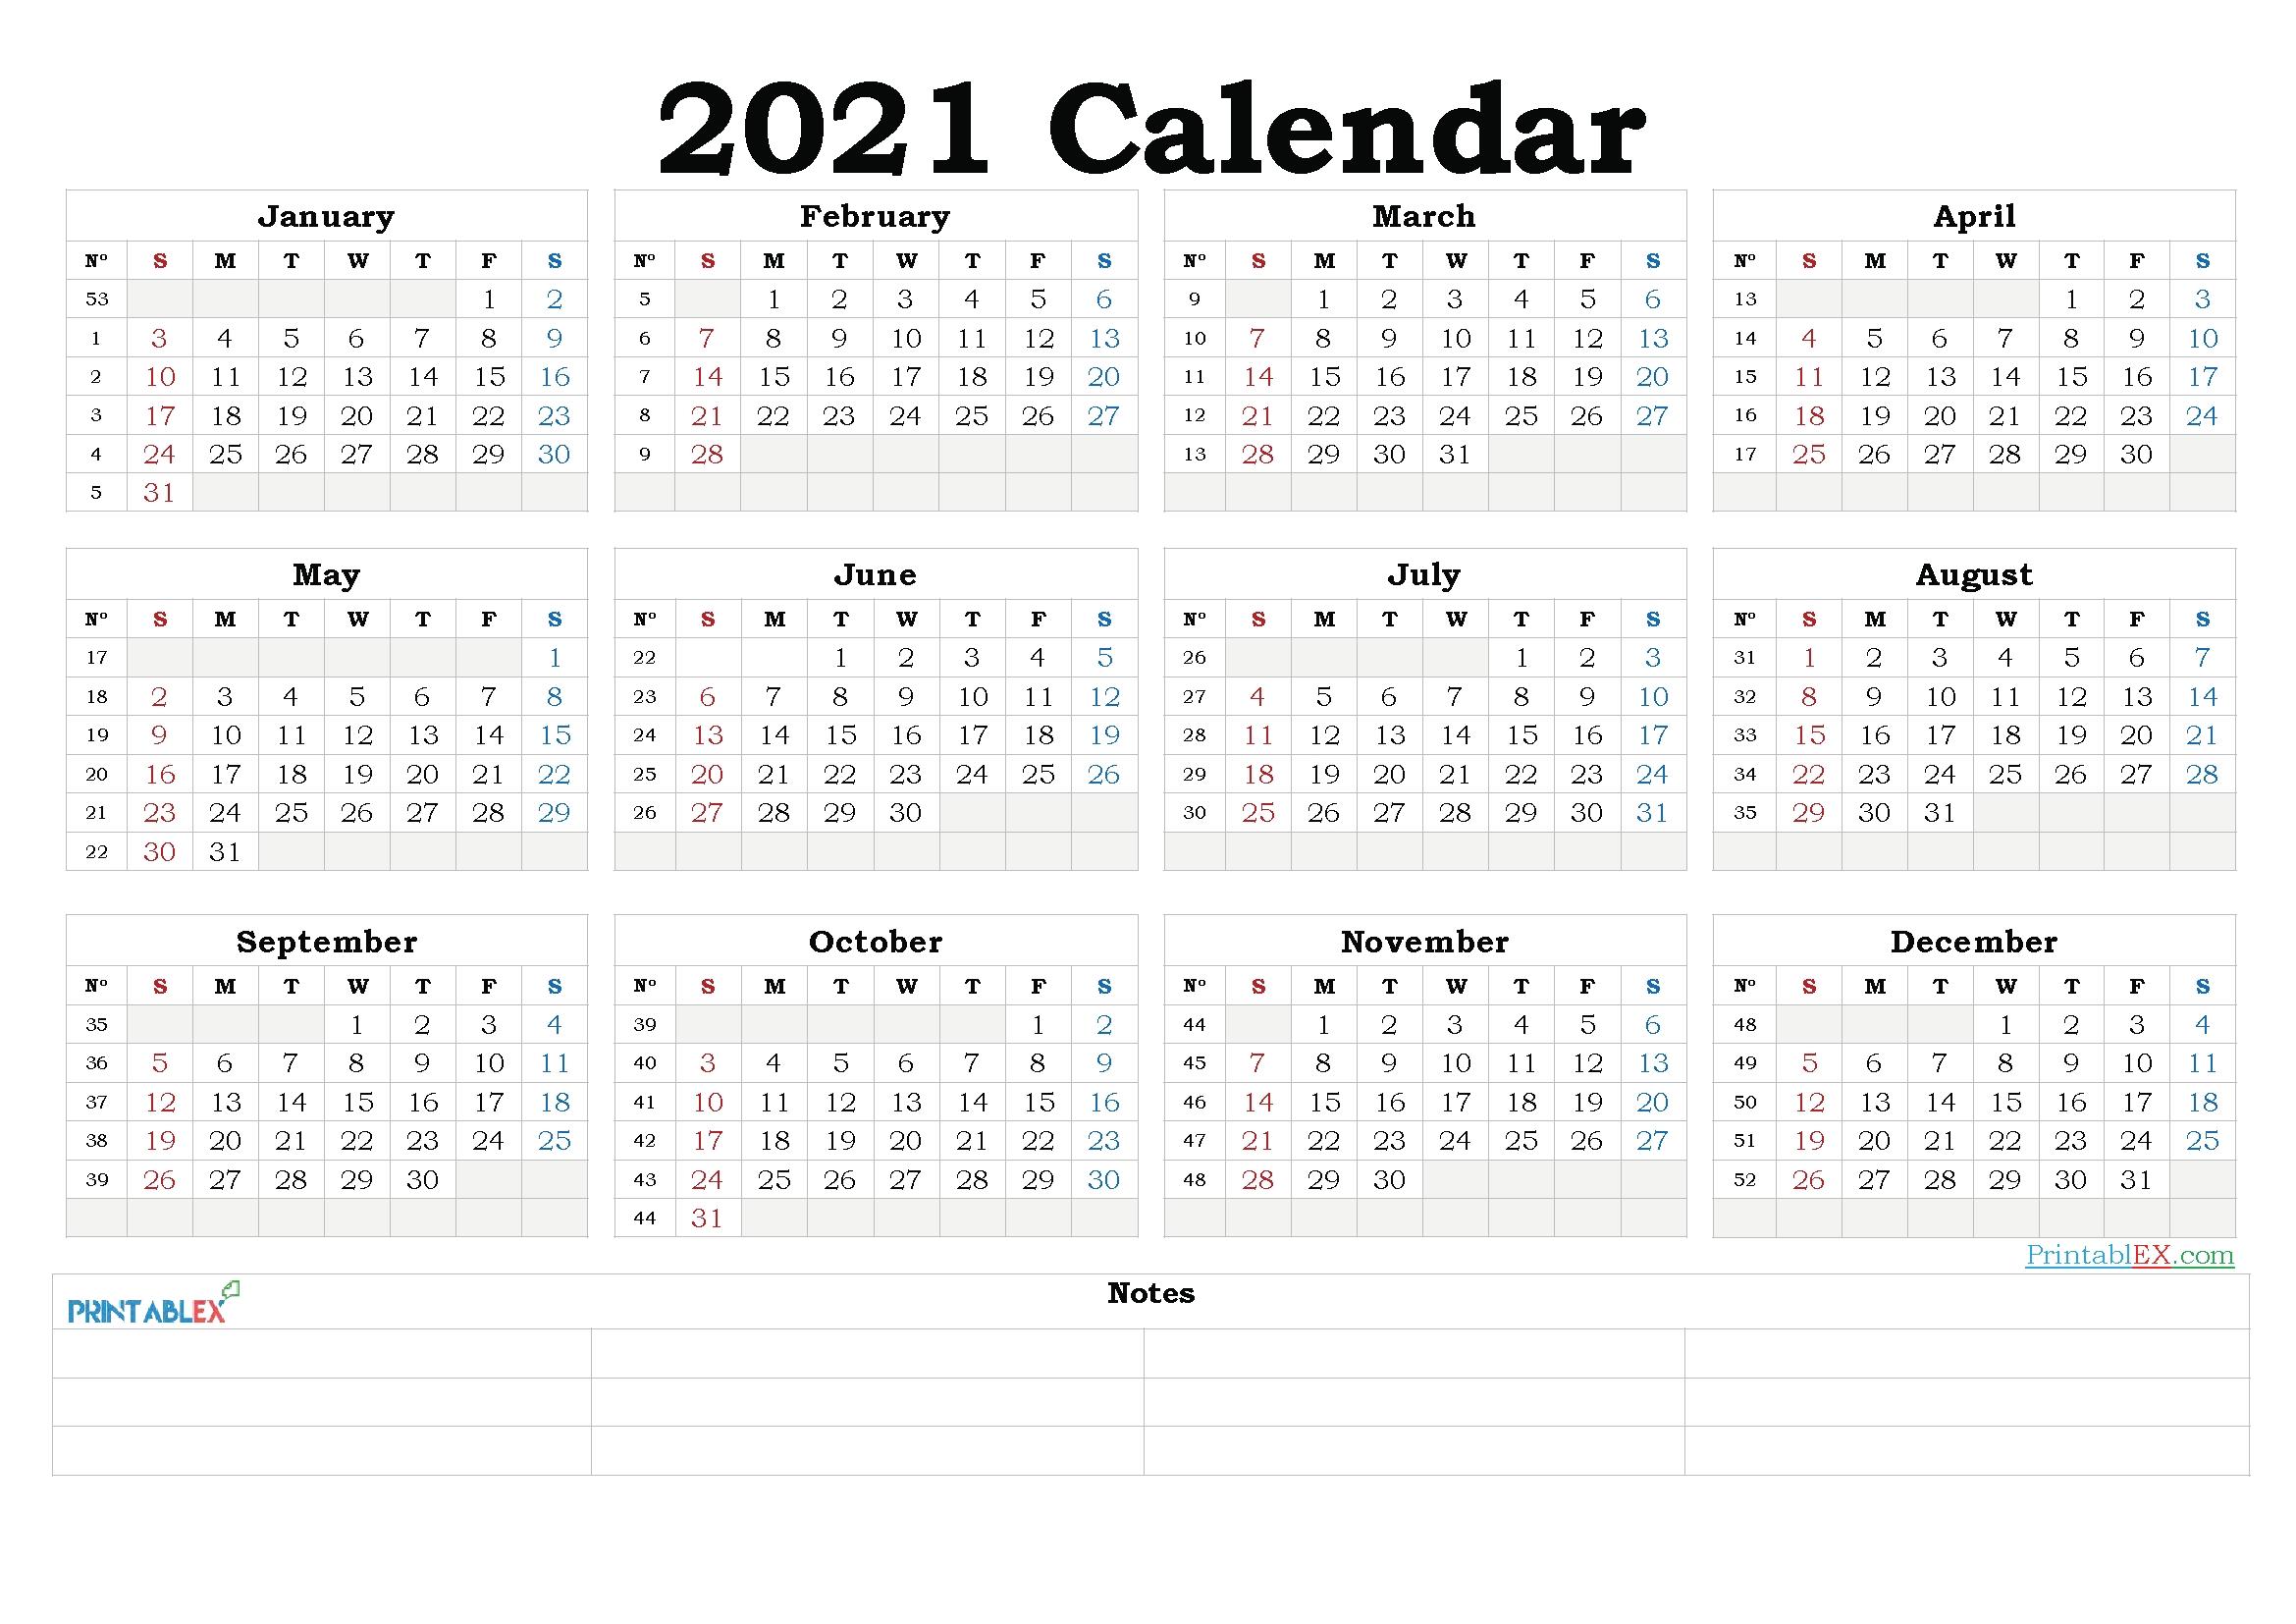 Word Calendar Free Printable Downloadable 2021 Calendar - February 2021 Calendar Fee with regard to Free Printable 2021 Calendar Templates Word Photo